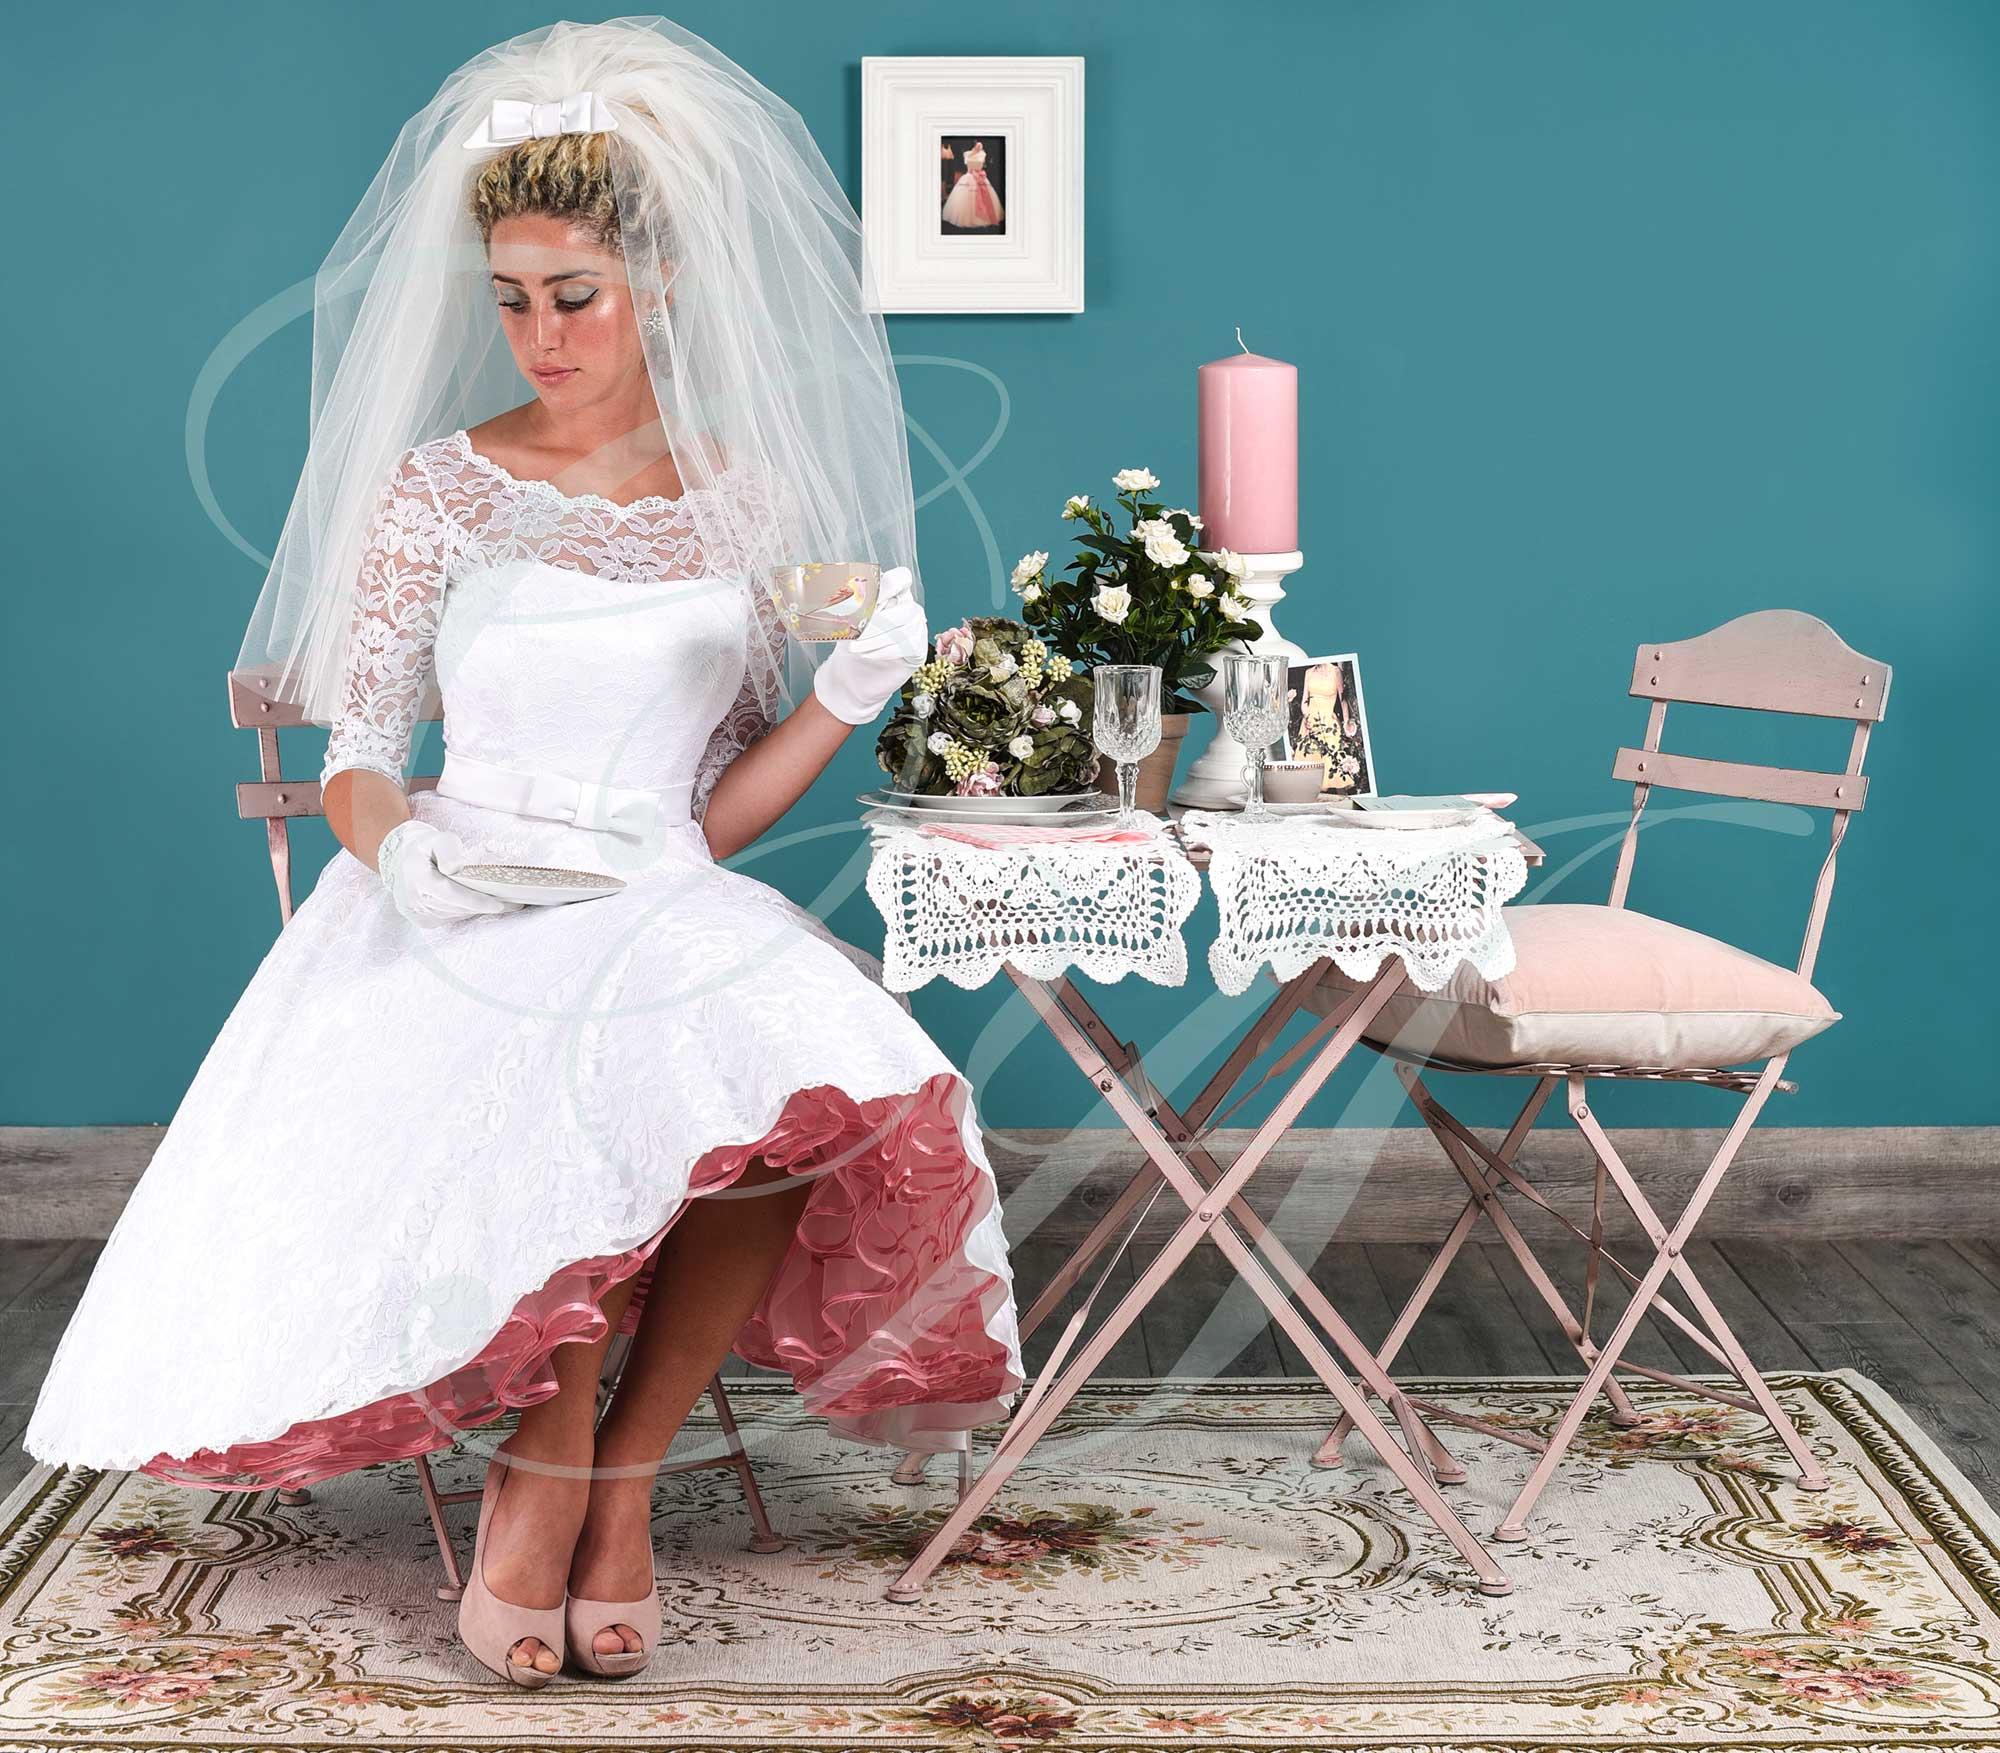 Vintage Wedding Dresses East London: 1950s & 1960s Style Wedding Dresses